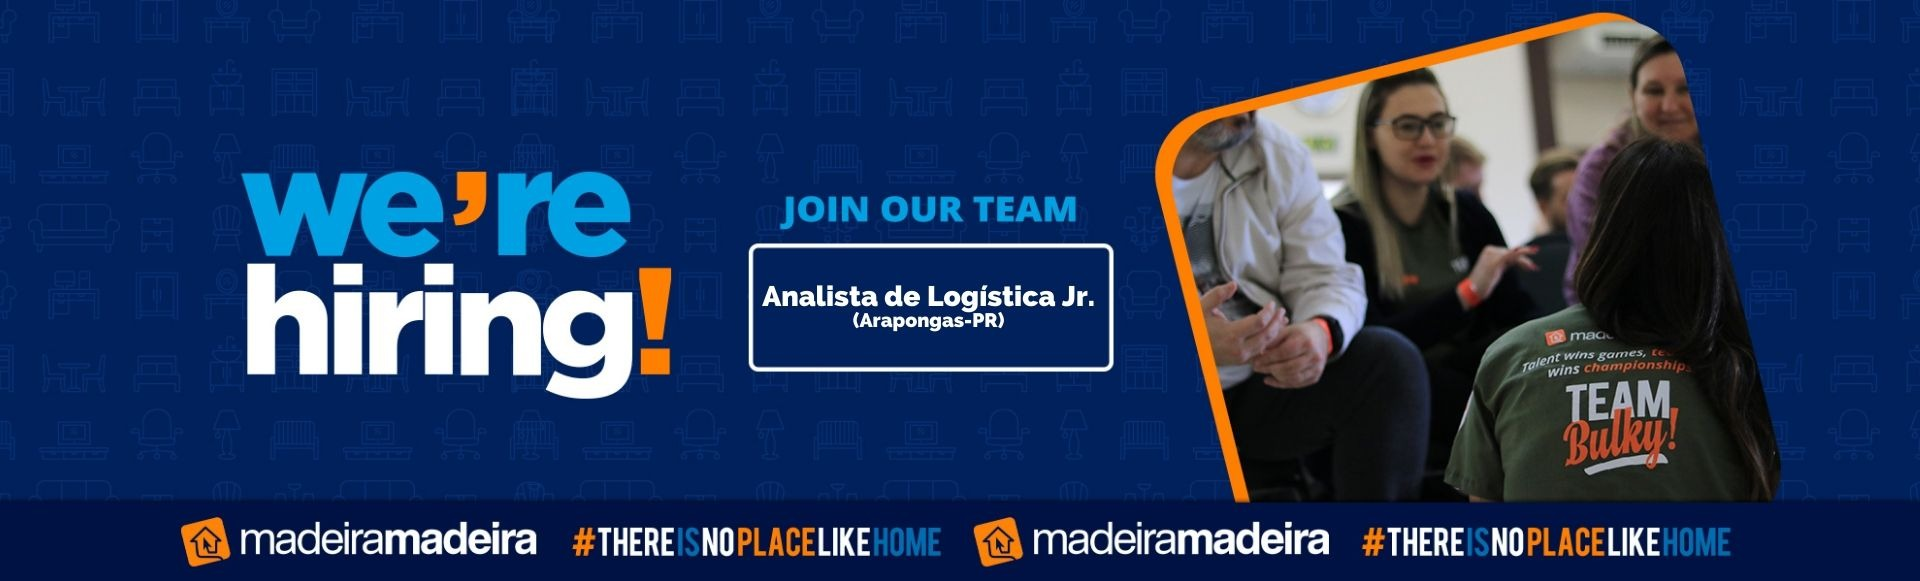 Analista de Logística Jr. (Arapongas-PR)